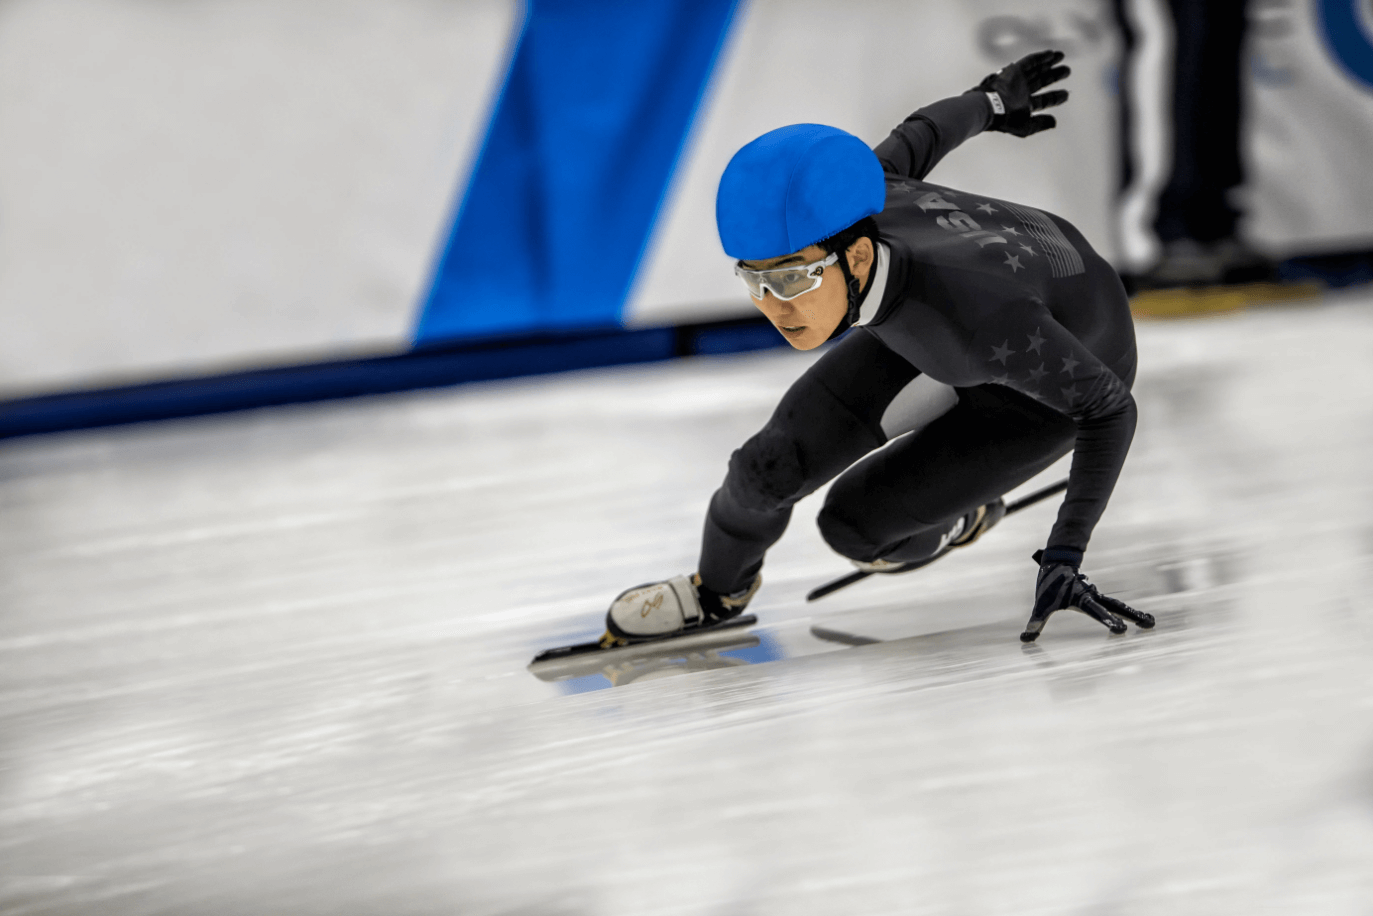 USA SPEED SKATER & EXPLOSIVE PERFORMANCE ATHLETE